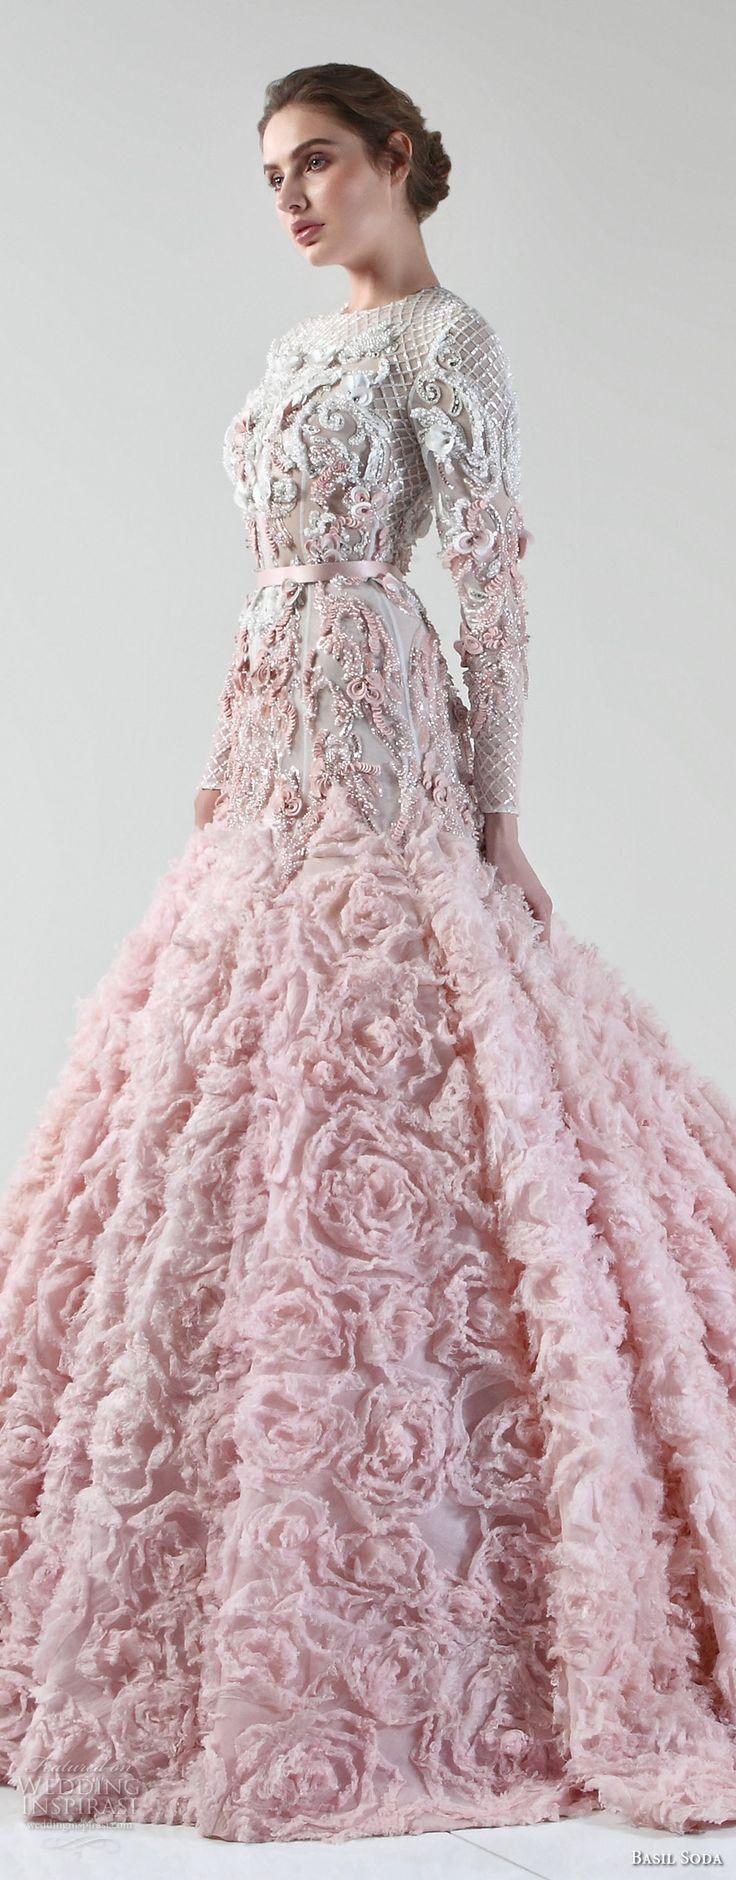 basil soda 2017 bridal long sleeves jewel neckline full embellishment pink princess a  line wedding dress chapel train (1) zv -- Basil Soda 2017 Wedding Dresses